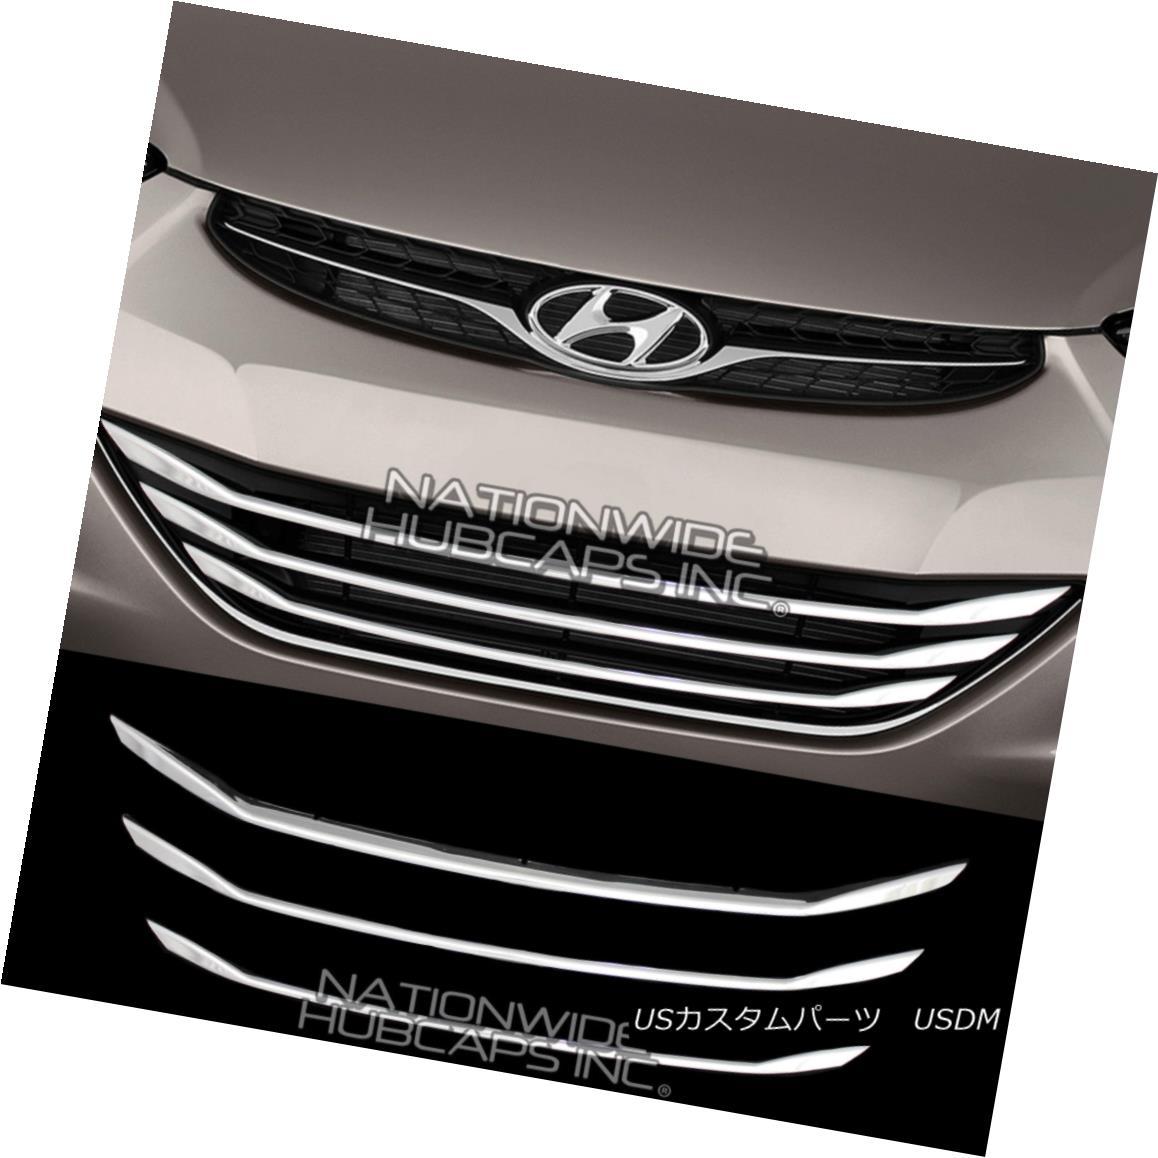 USグリル 11-16 Hyundai Elantra GLS CHROME Lower Grille Overlay 3 Grill Bar Trim Covers 11-16 Hyundai Elantra GLS CHROME下部グリルオーバーレイ3グリルバートリムカバー